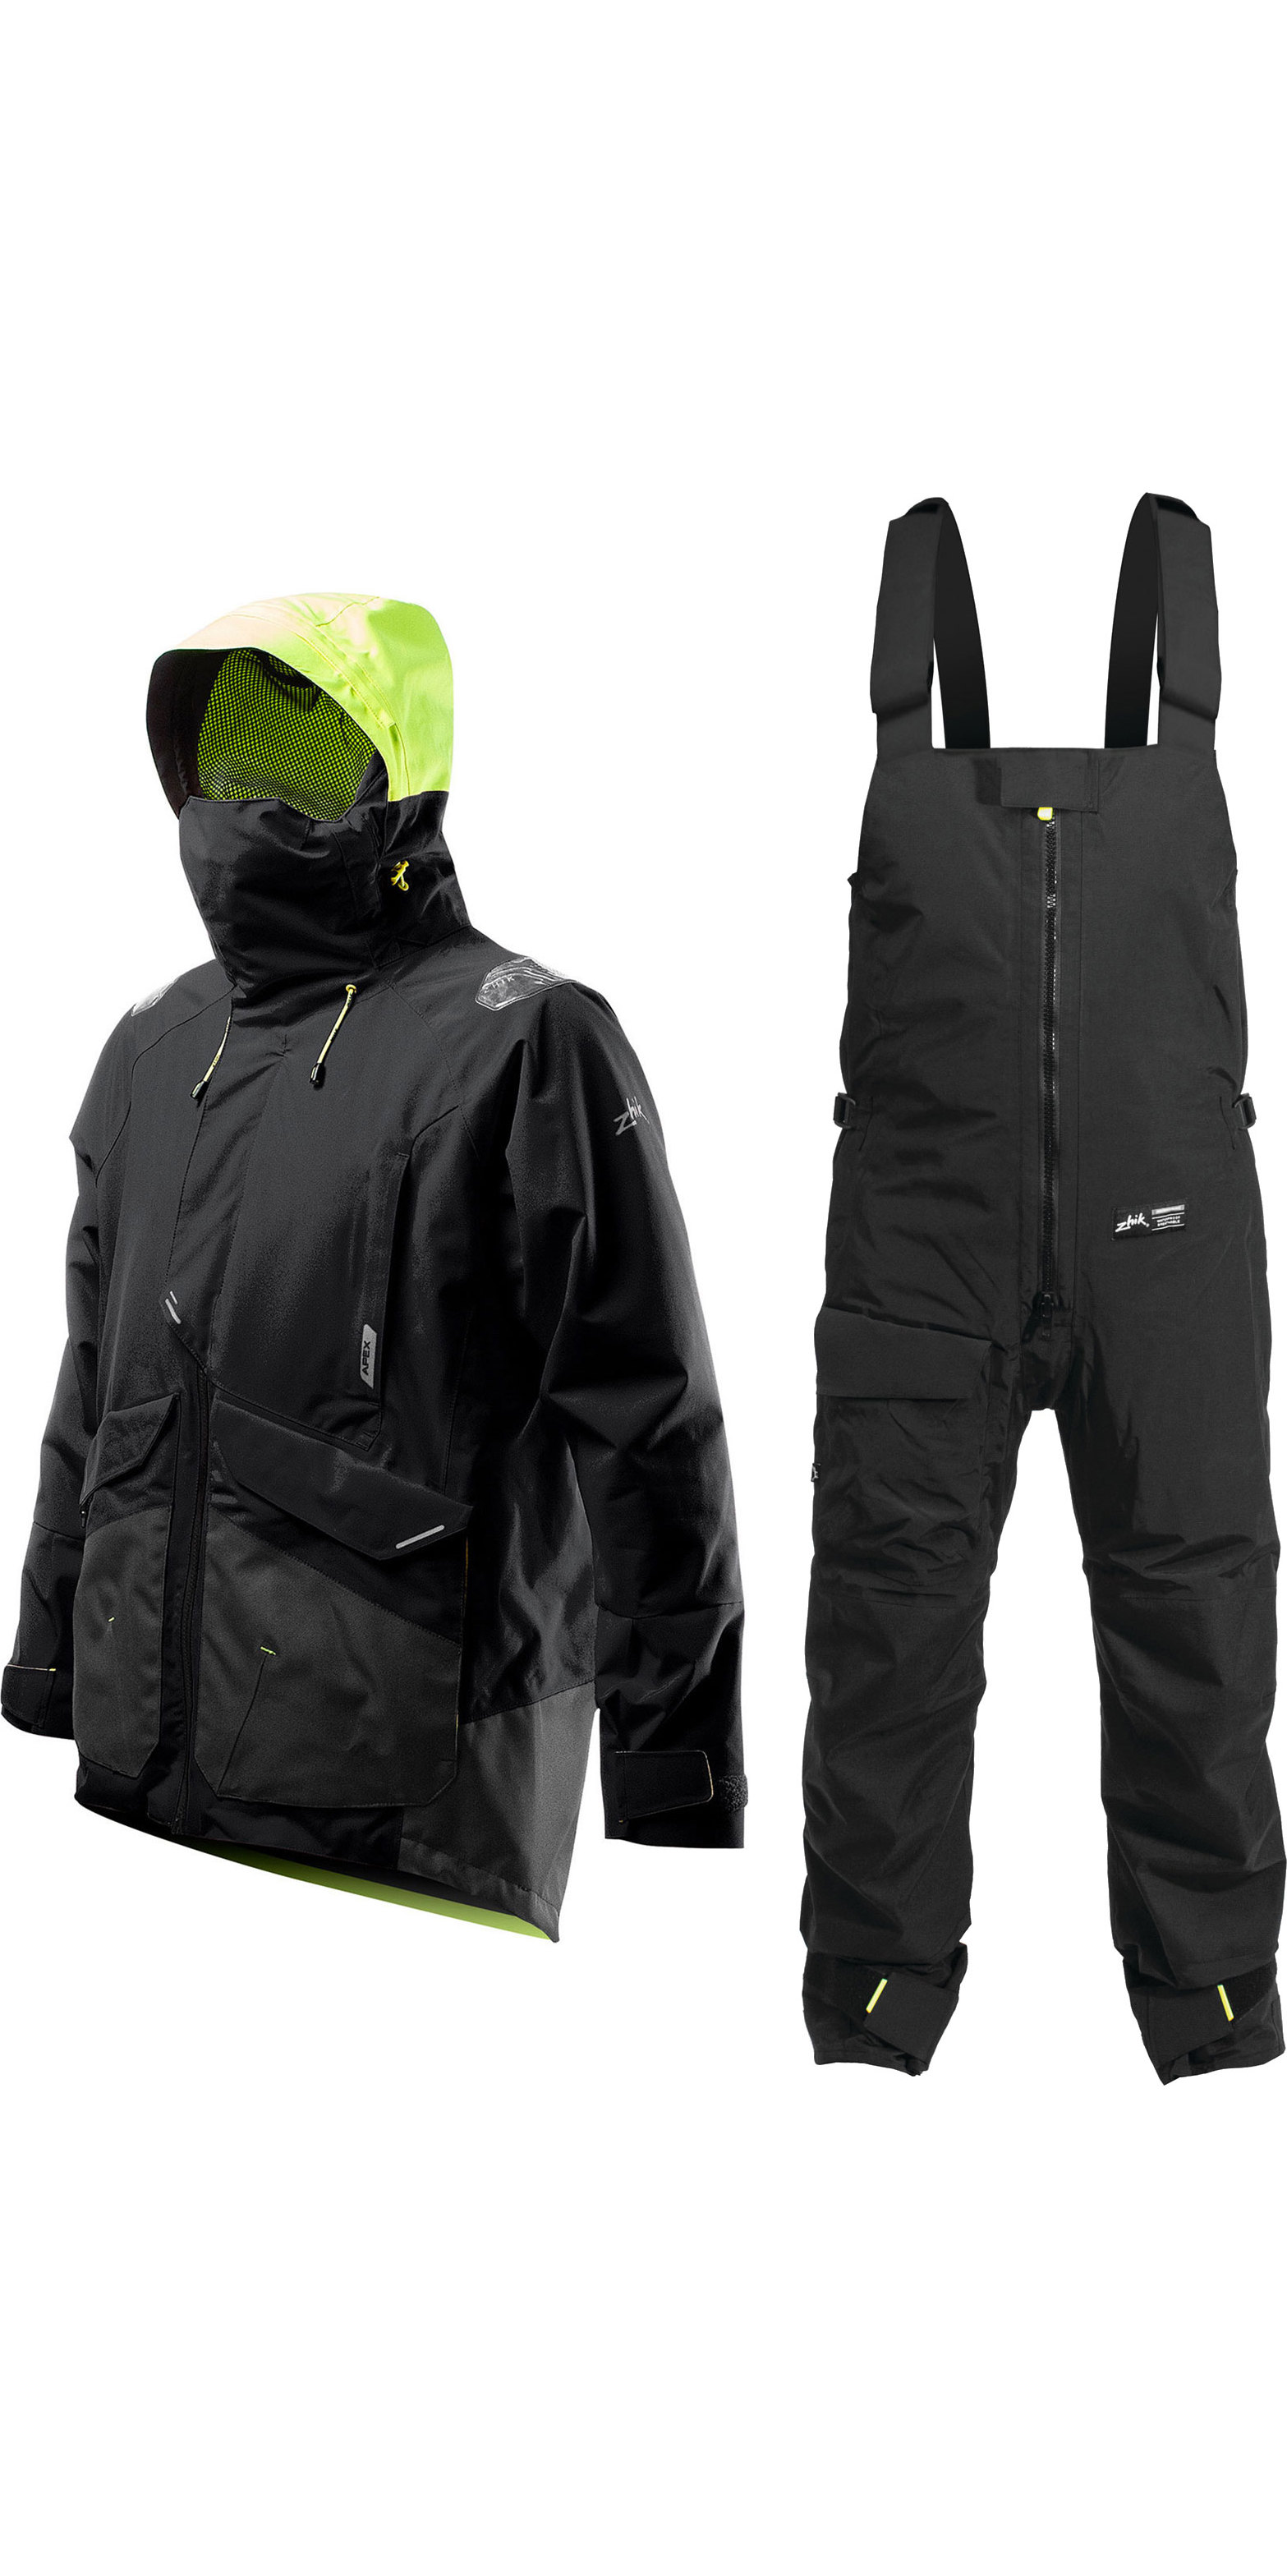 2020 Zhik Mens Apex Offshore Sailing Jacket & Kiama Trouser Combi Set Anthracite Black